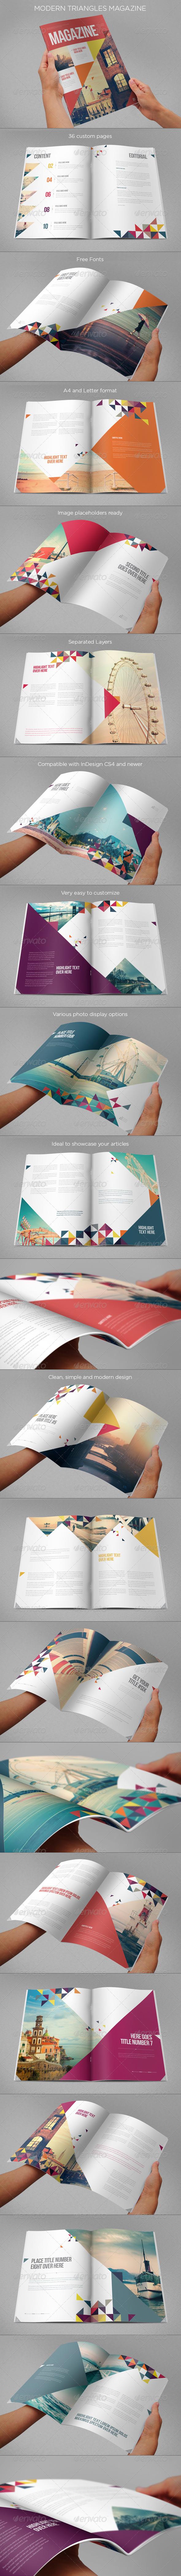 Modern Triangles Magazine - Magazines Print Templates